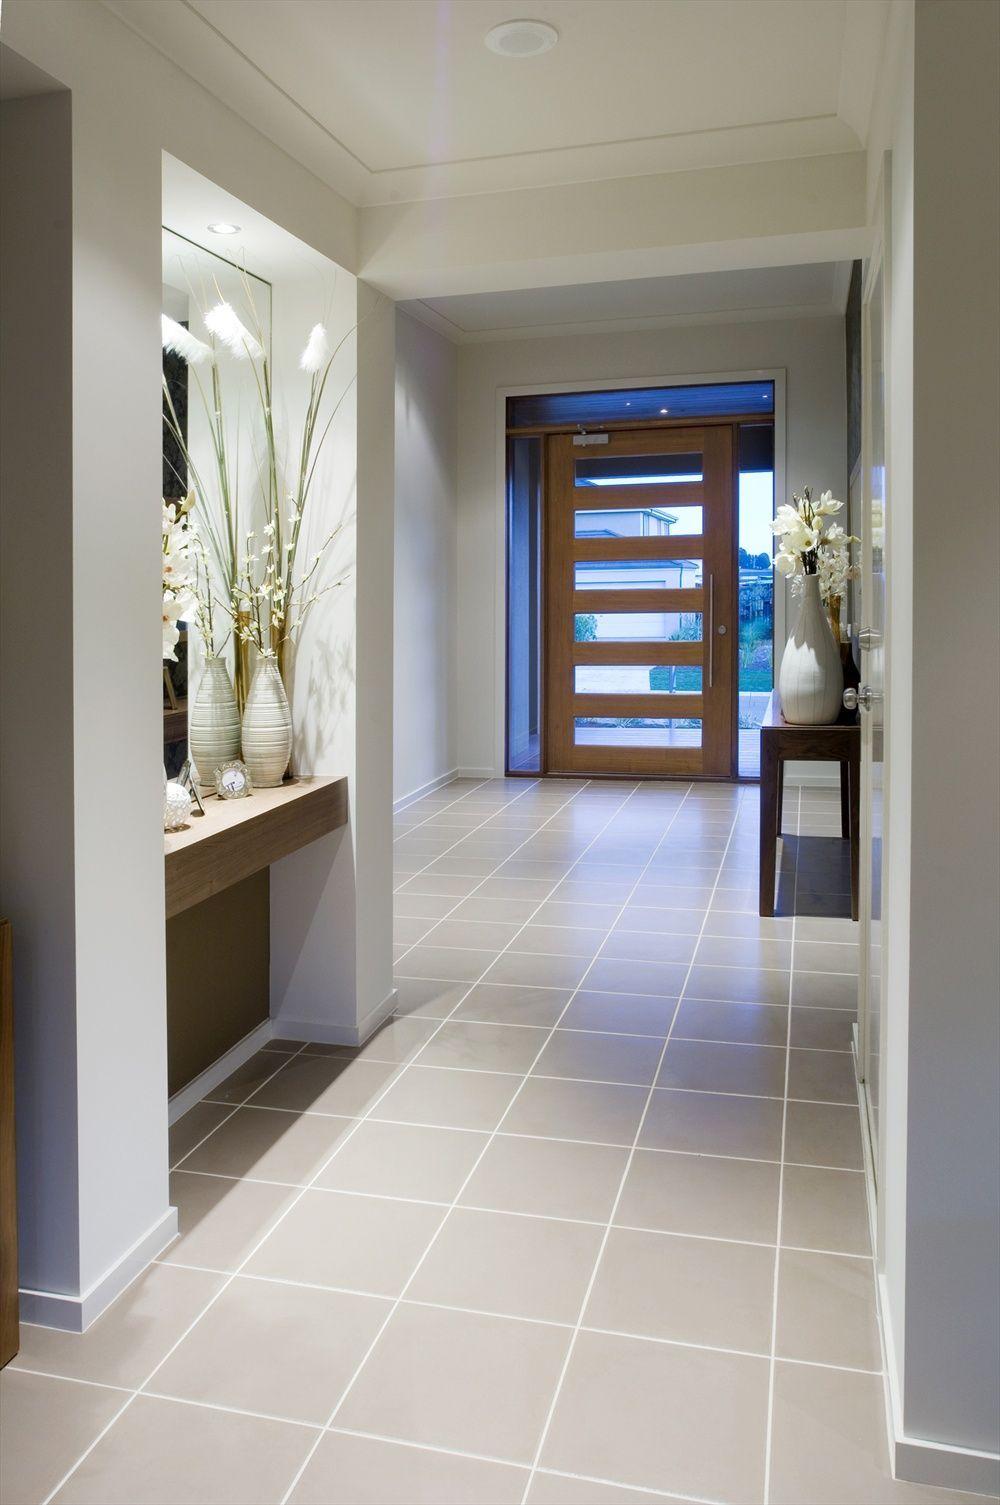 39 Contemporary Hallway Tiles Decortez Contemporary Hallway Living Room Tiles Home